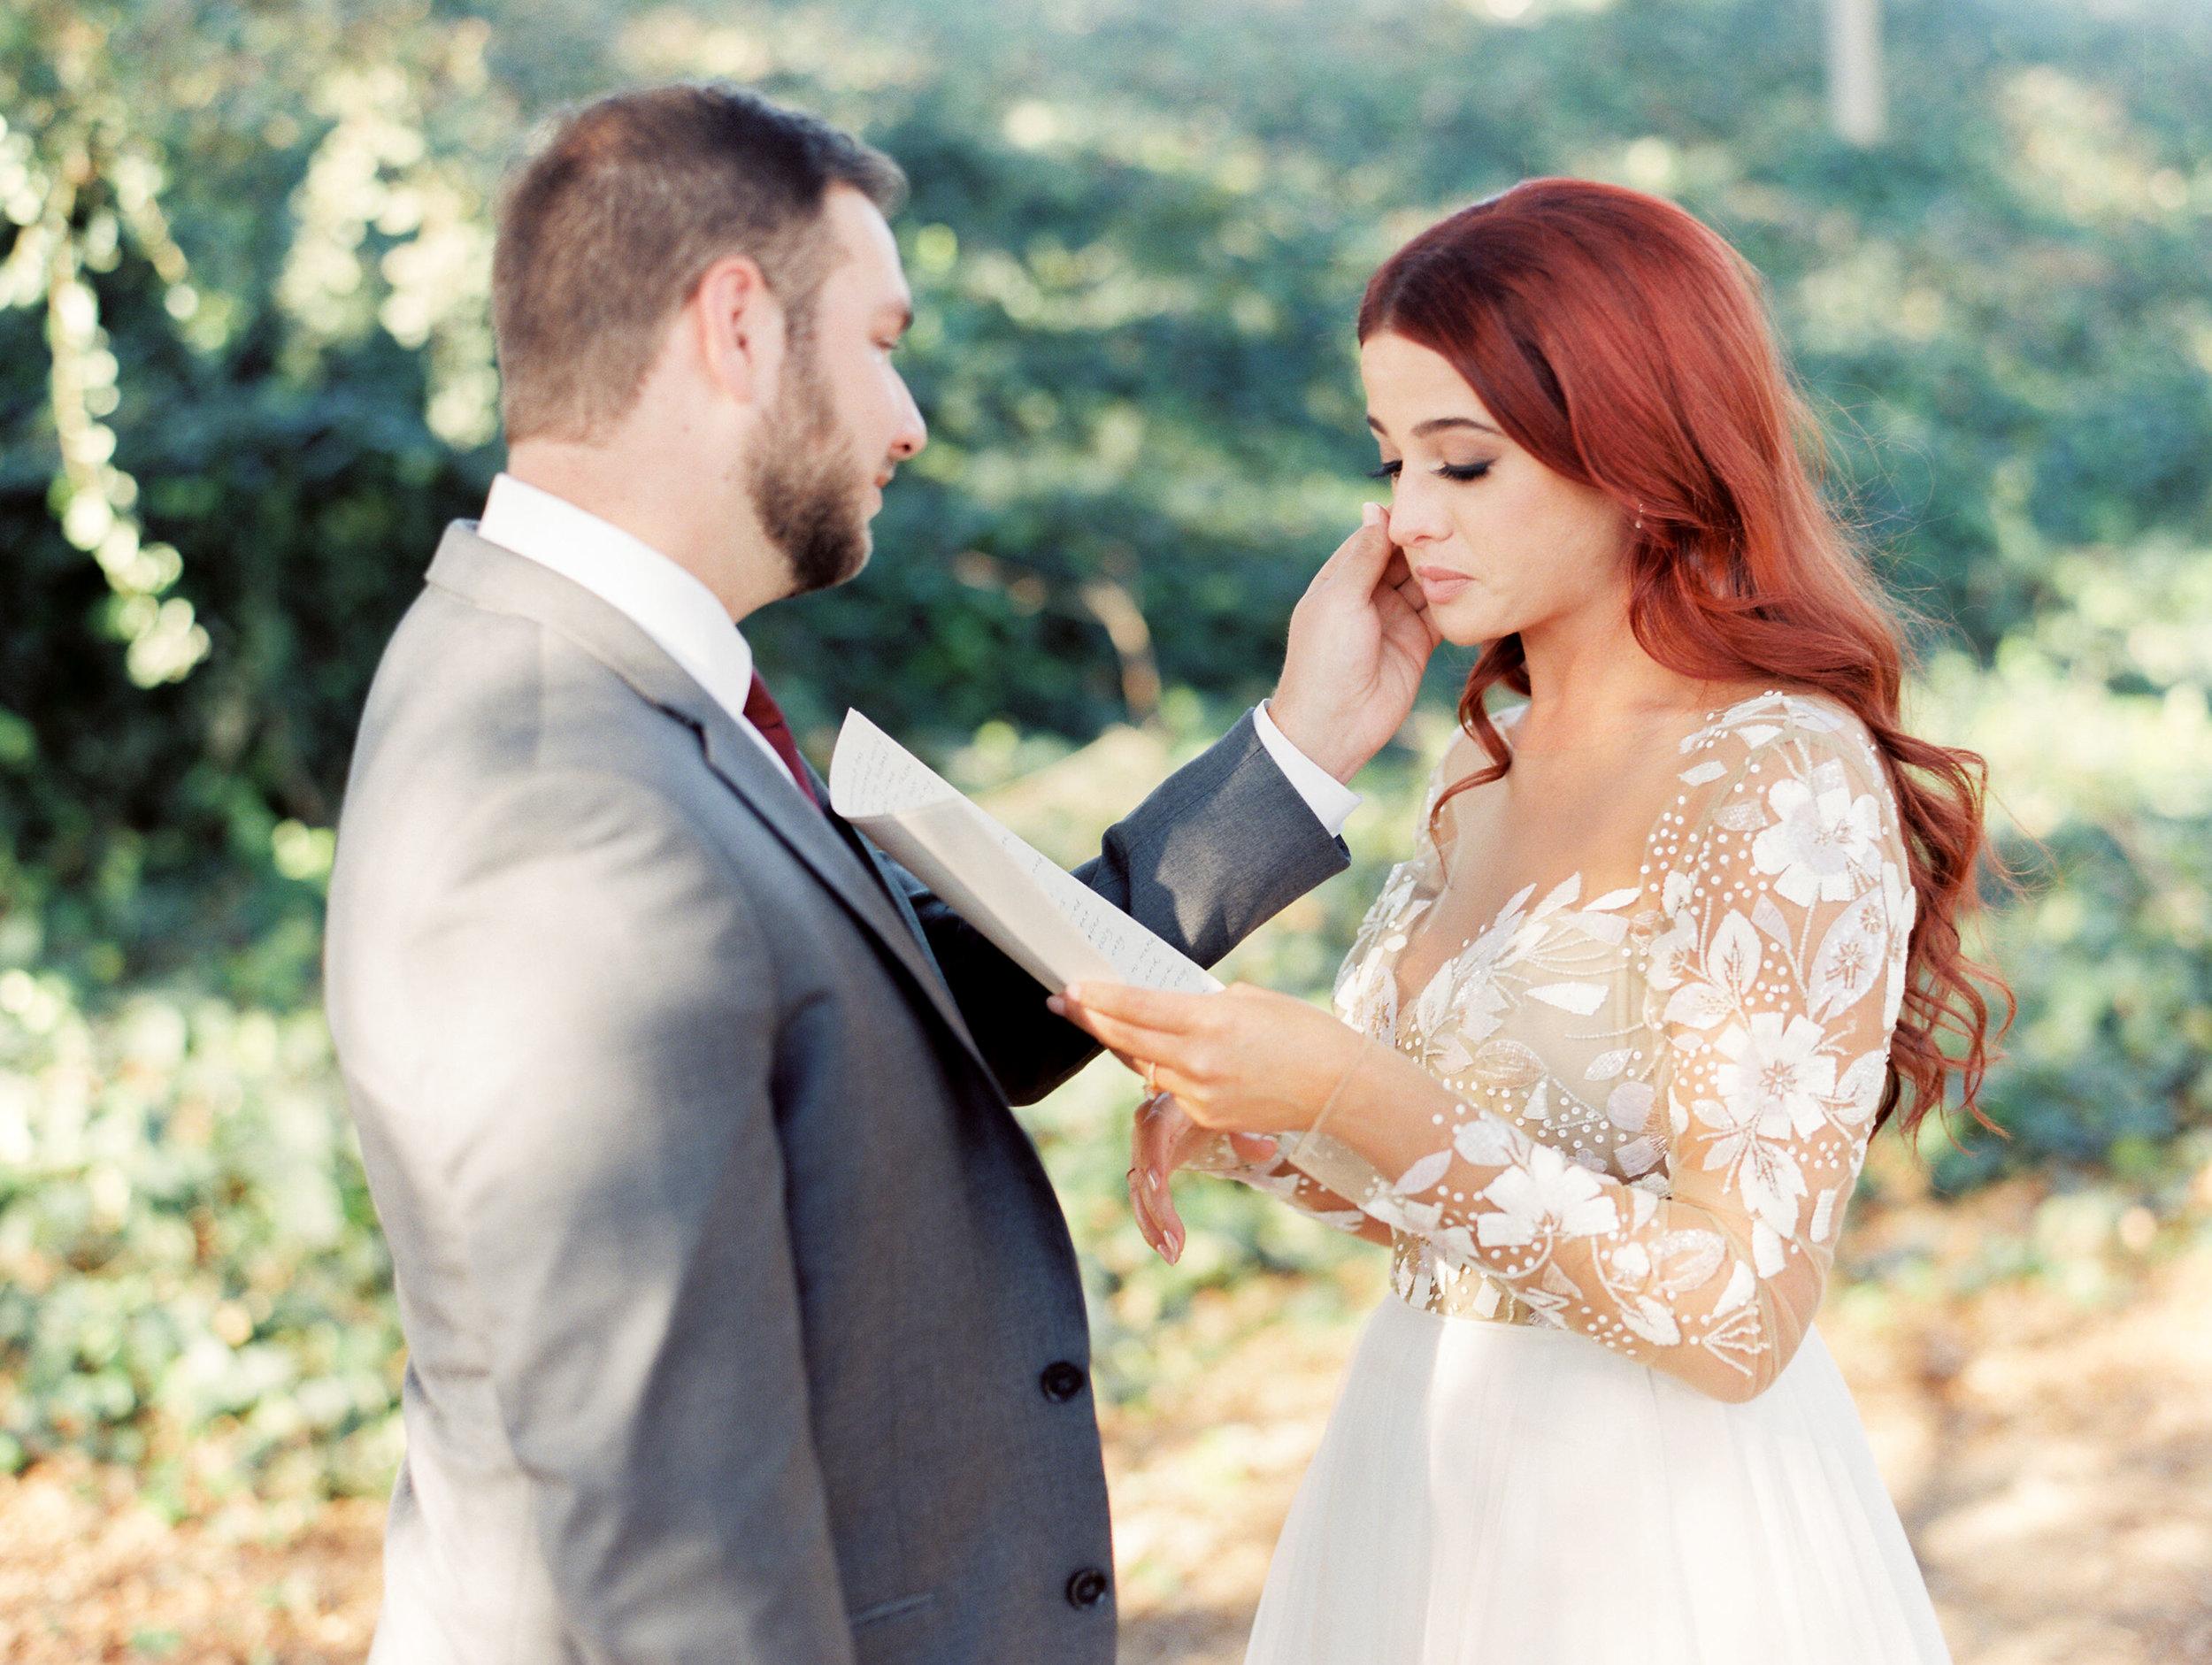 scribner-bend-vineyards-wedding-in-sacramento-california-50.jpg